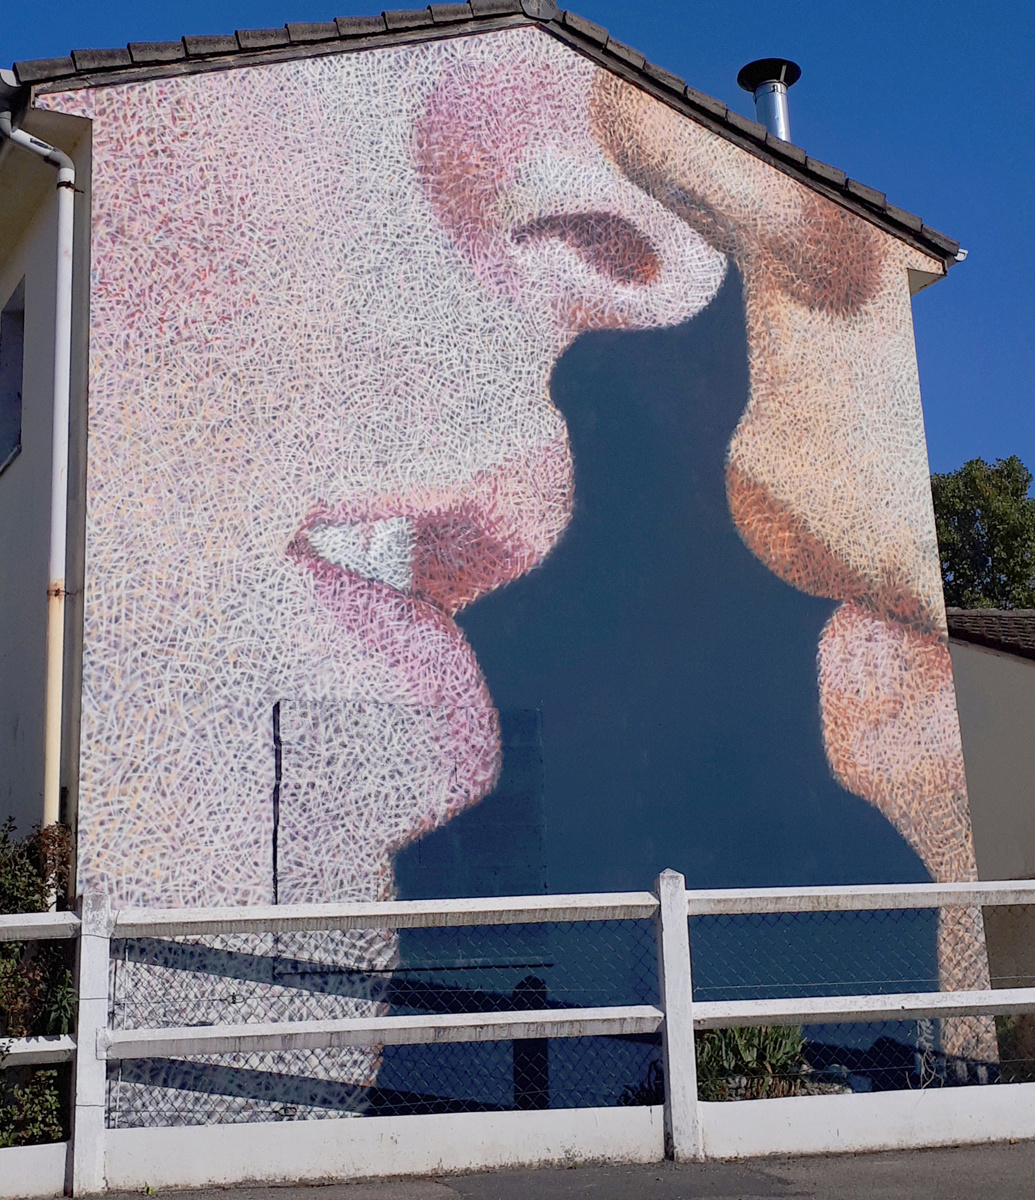 [street art-rue et manifs] ROUEN IMPRESSIONNEE 2020  20201016